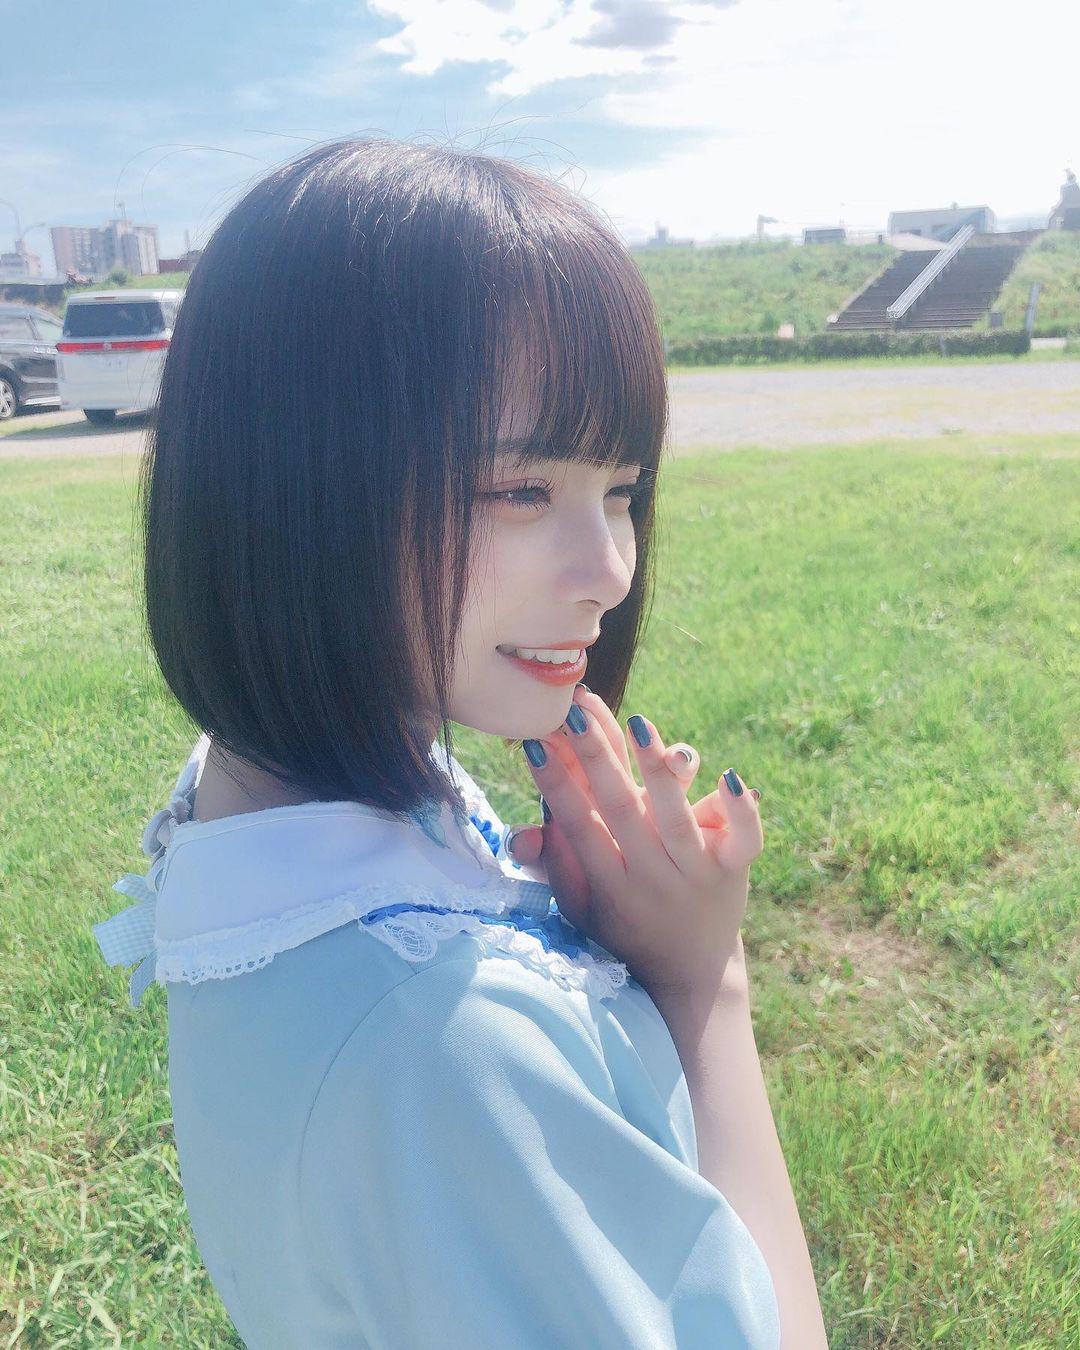 宫崎彩(宫崎あみさ)个人资料,短发萝莉偶像写真欣赏